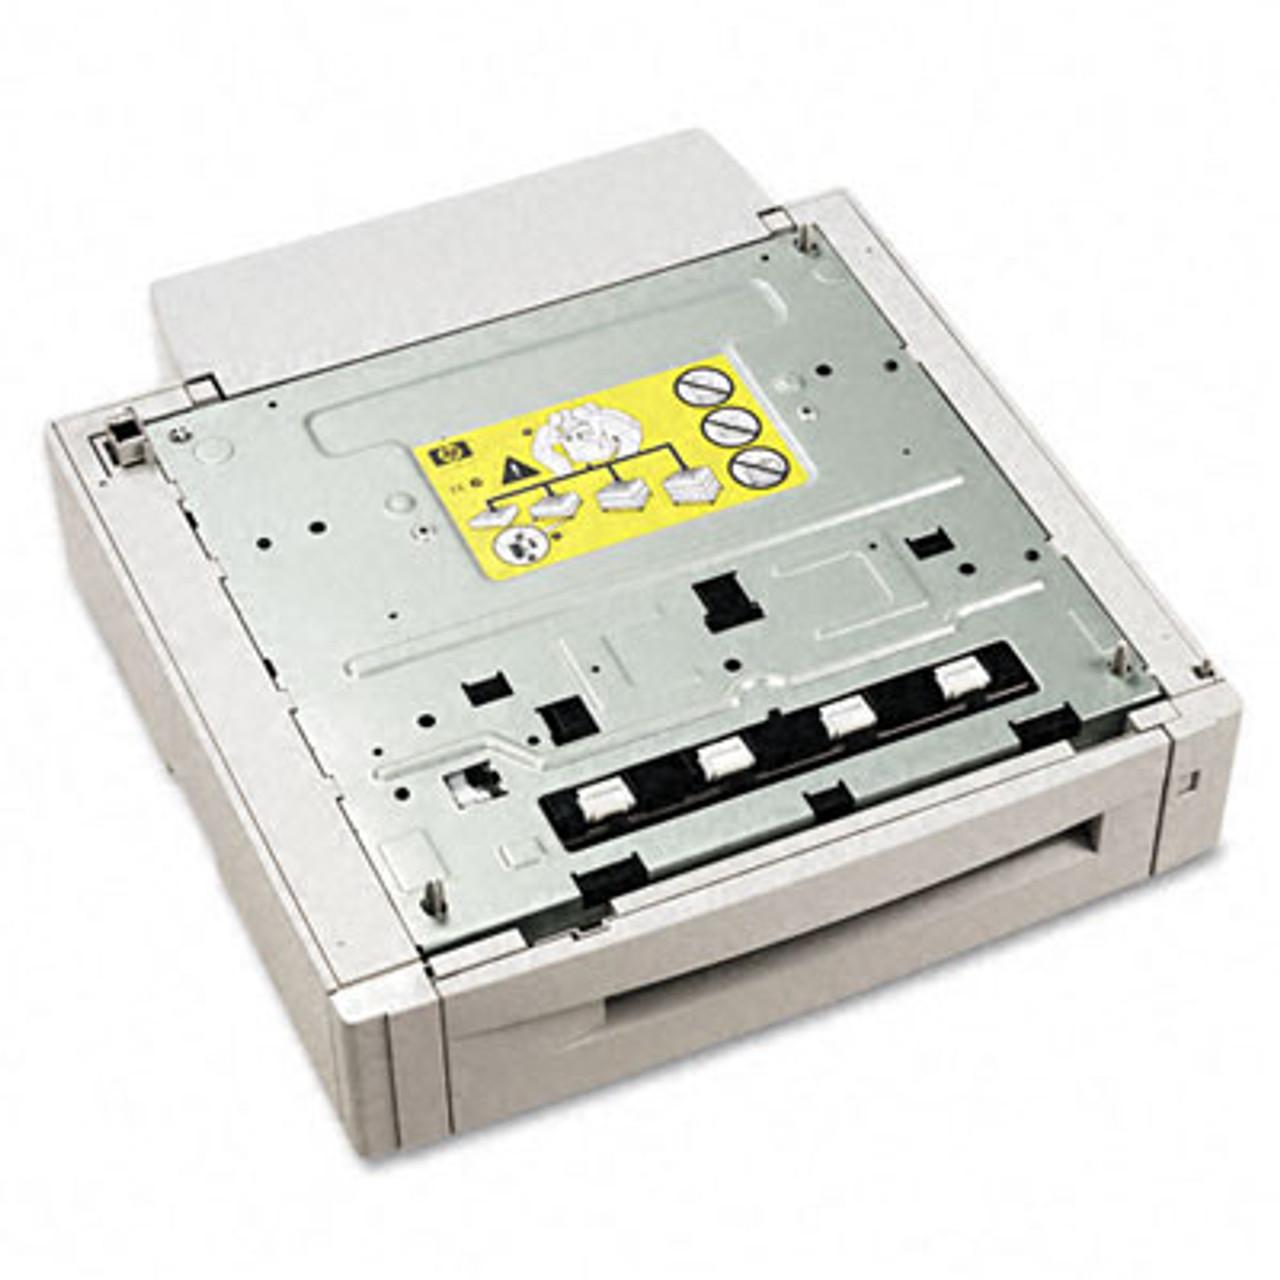 500 Sheet Optional Tray HP Color LaserJet 4650